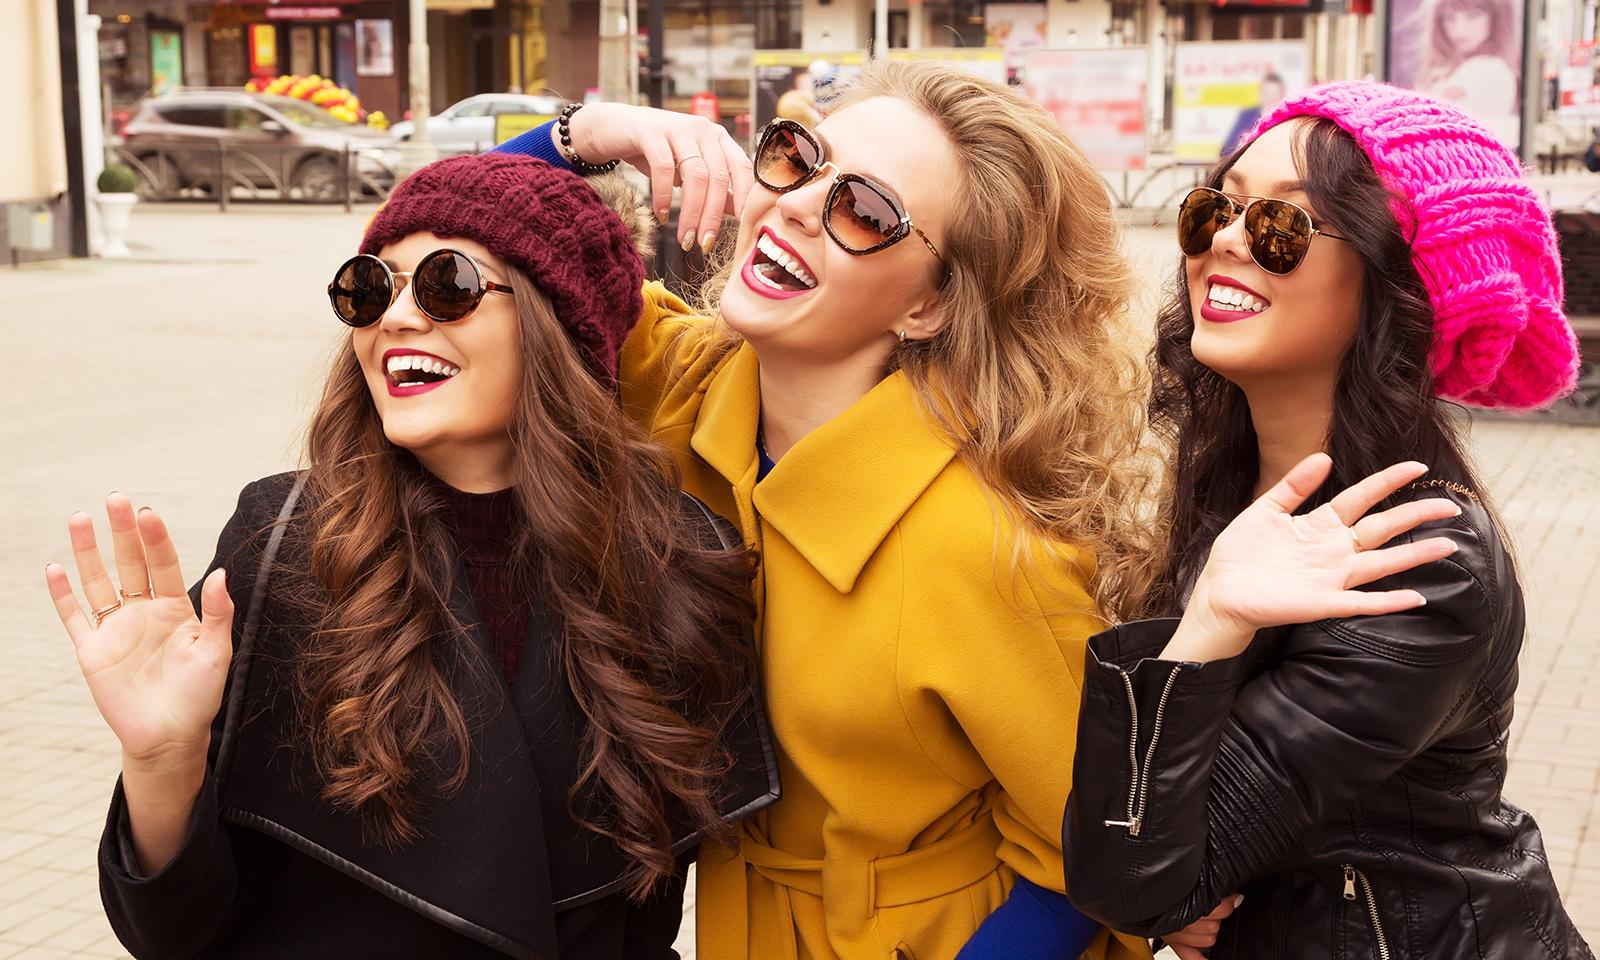 three-friends-waving-colorful-playful-fun-girlfriends